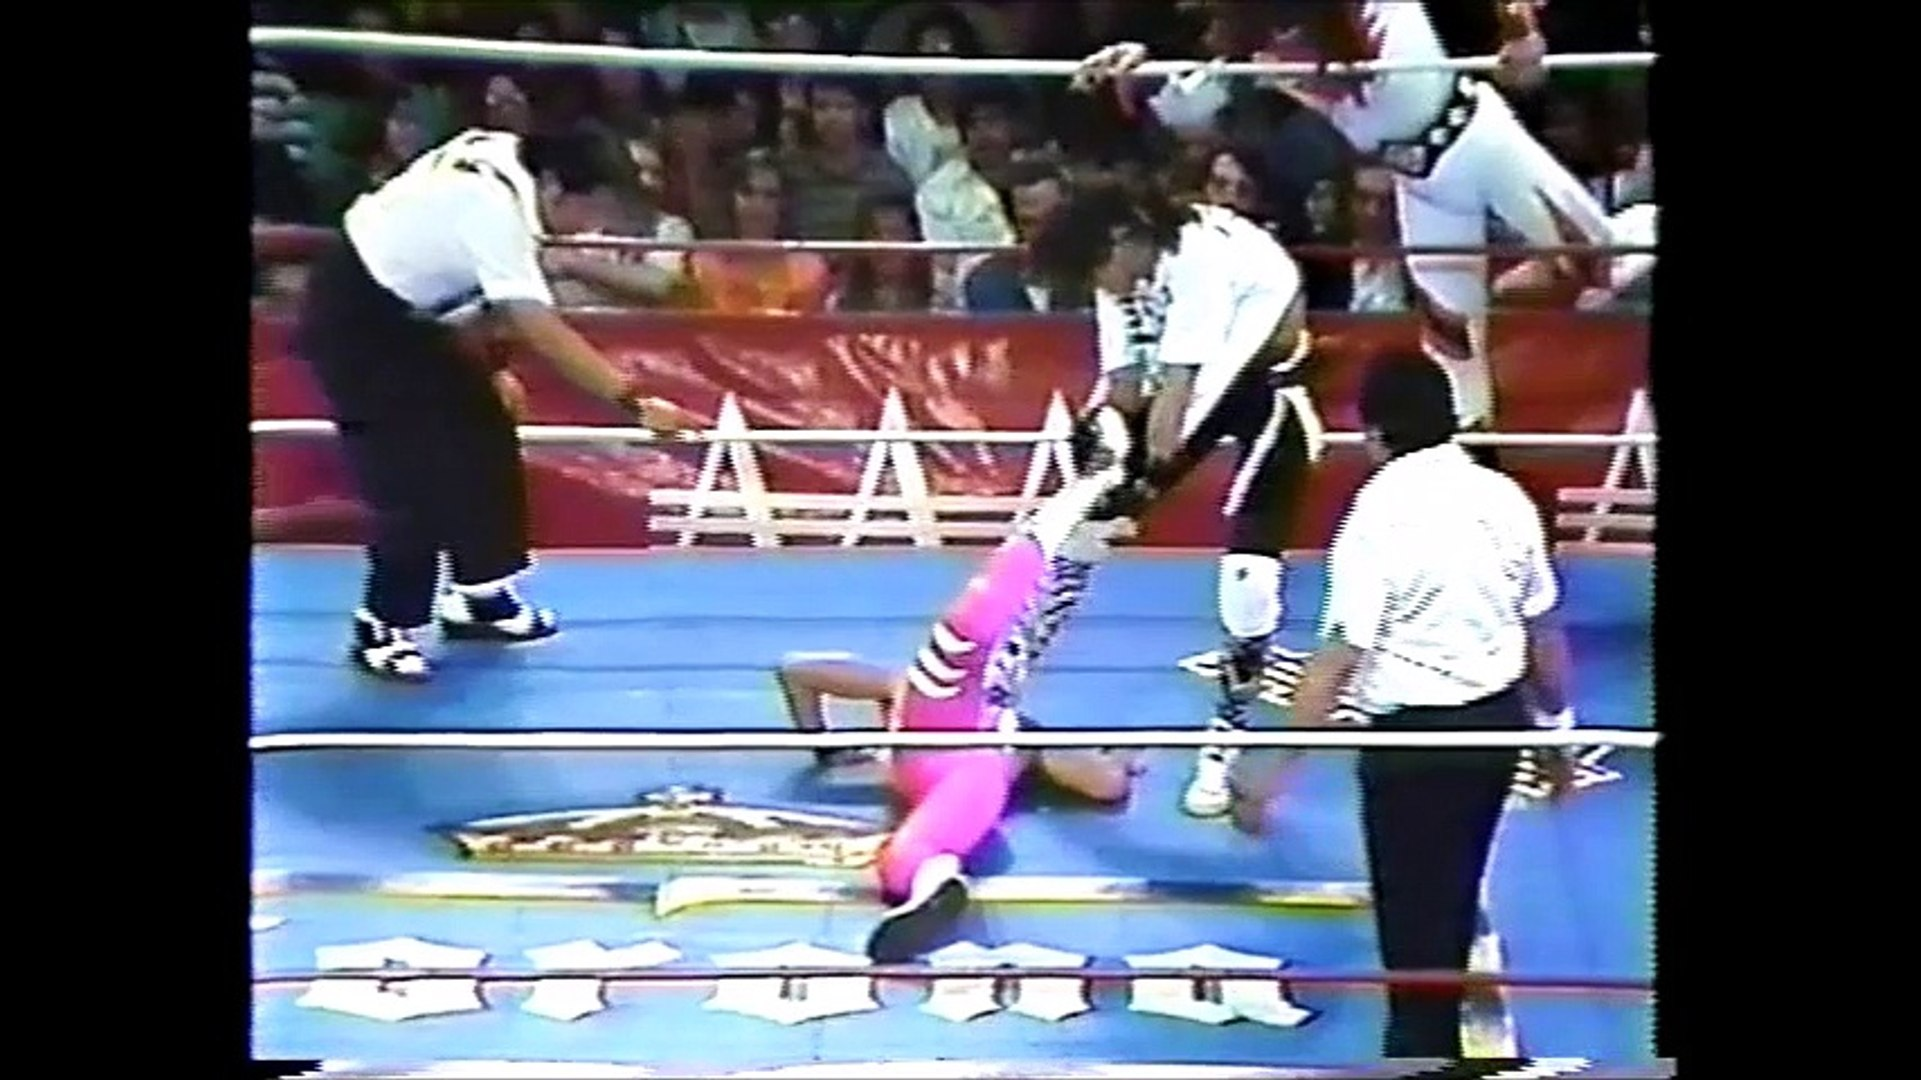 La Parka/Psicosis/Heavy Metal vs Rey Misterio Jr/Misterioso/Volador (AAA March 21st, 1993)